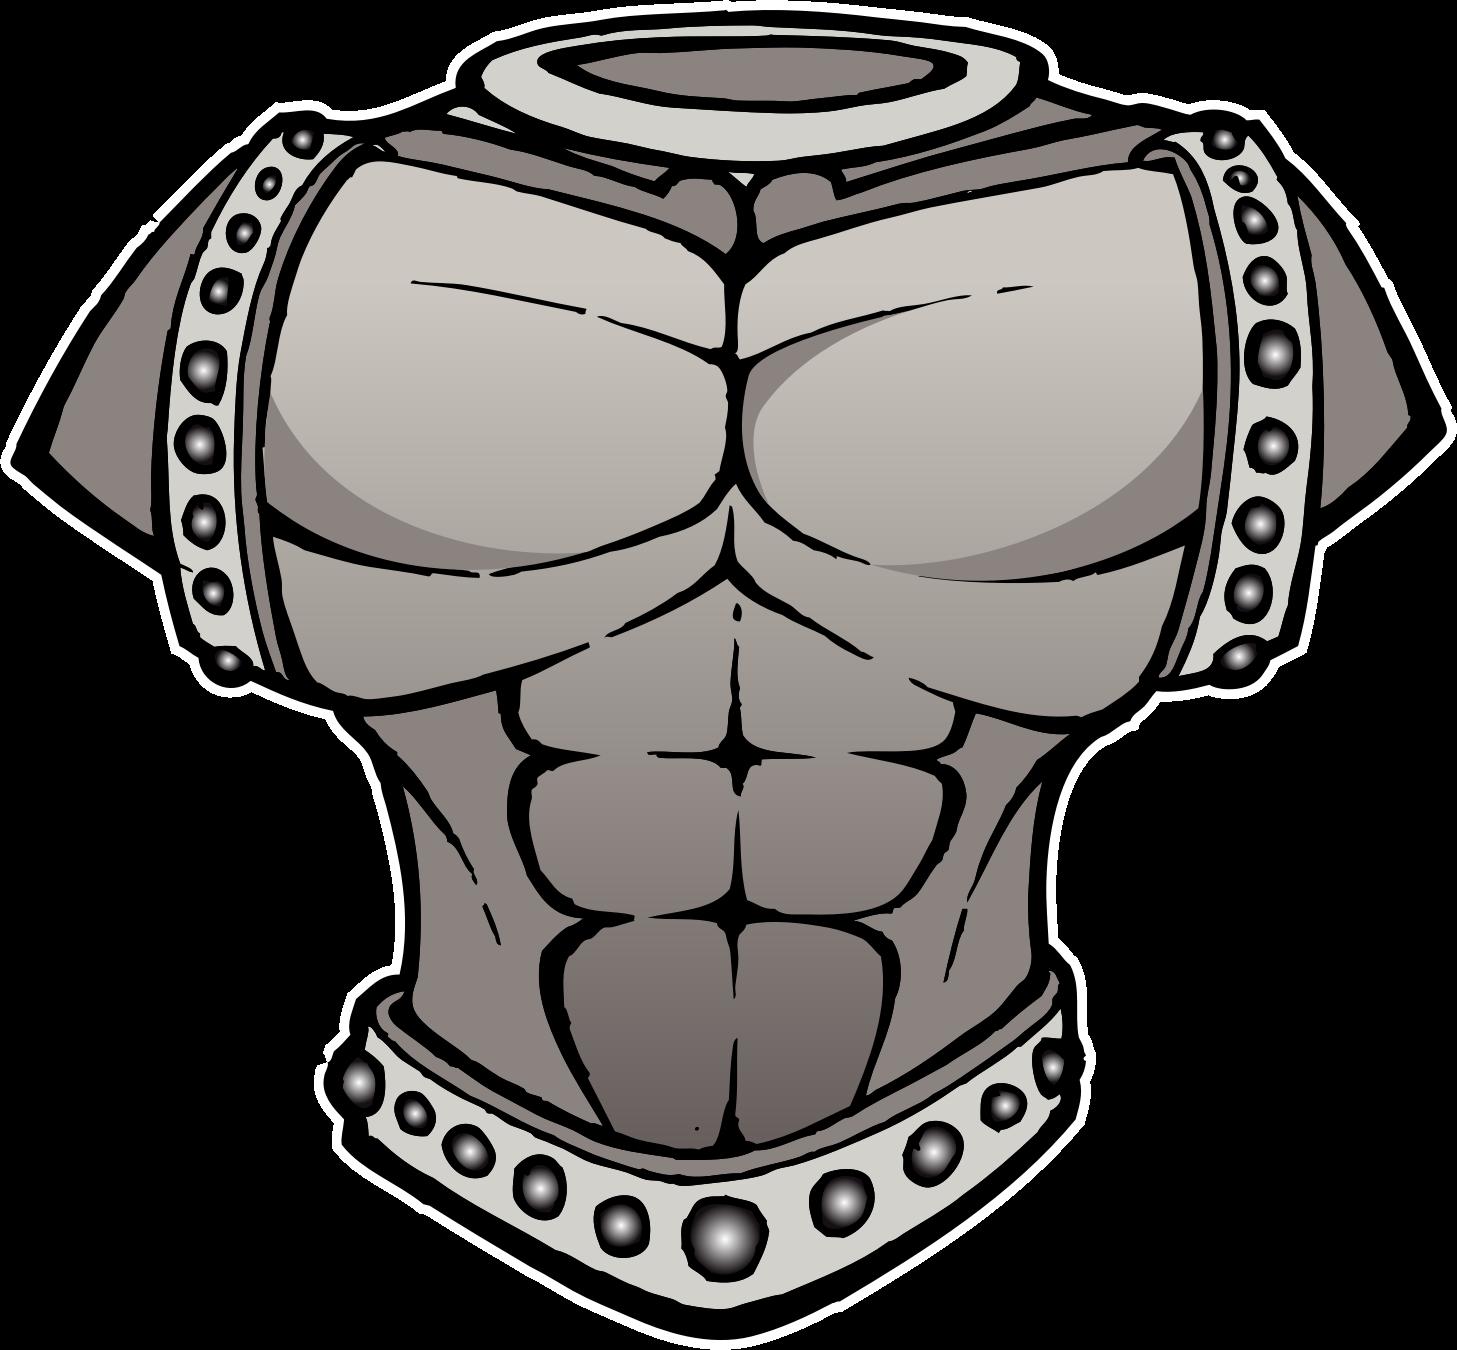 Free Armor Cliparts, Download Free Clip Art, Free Clip Art.